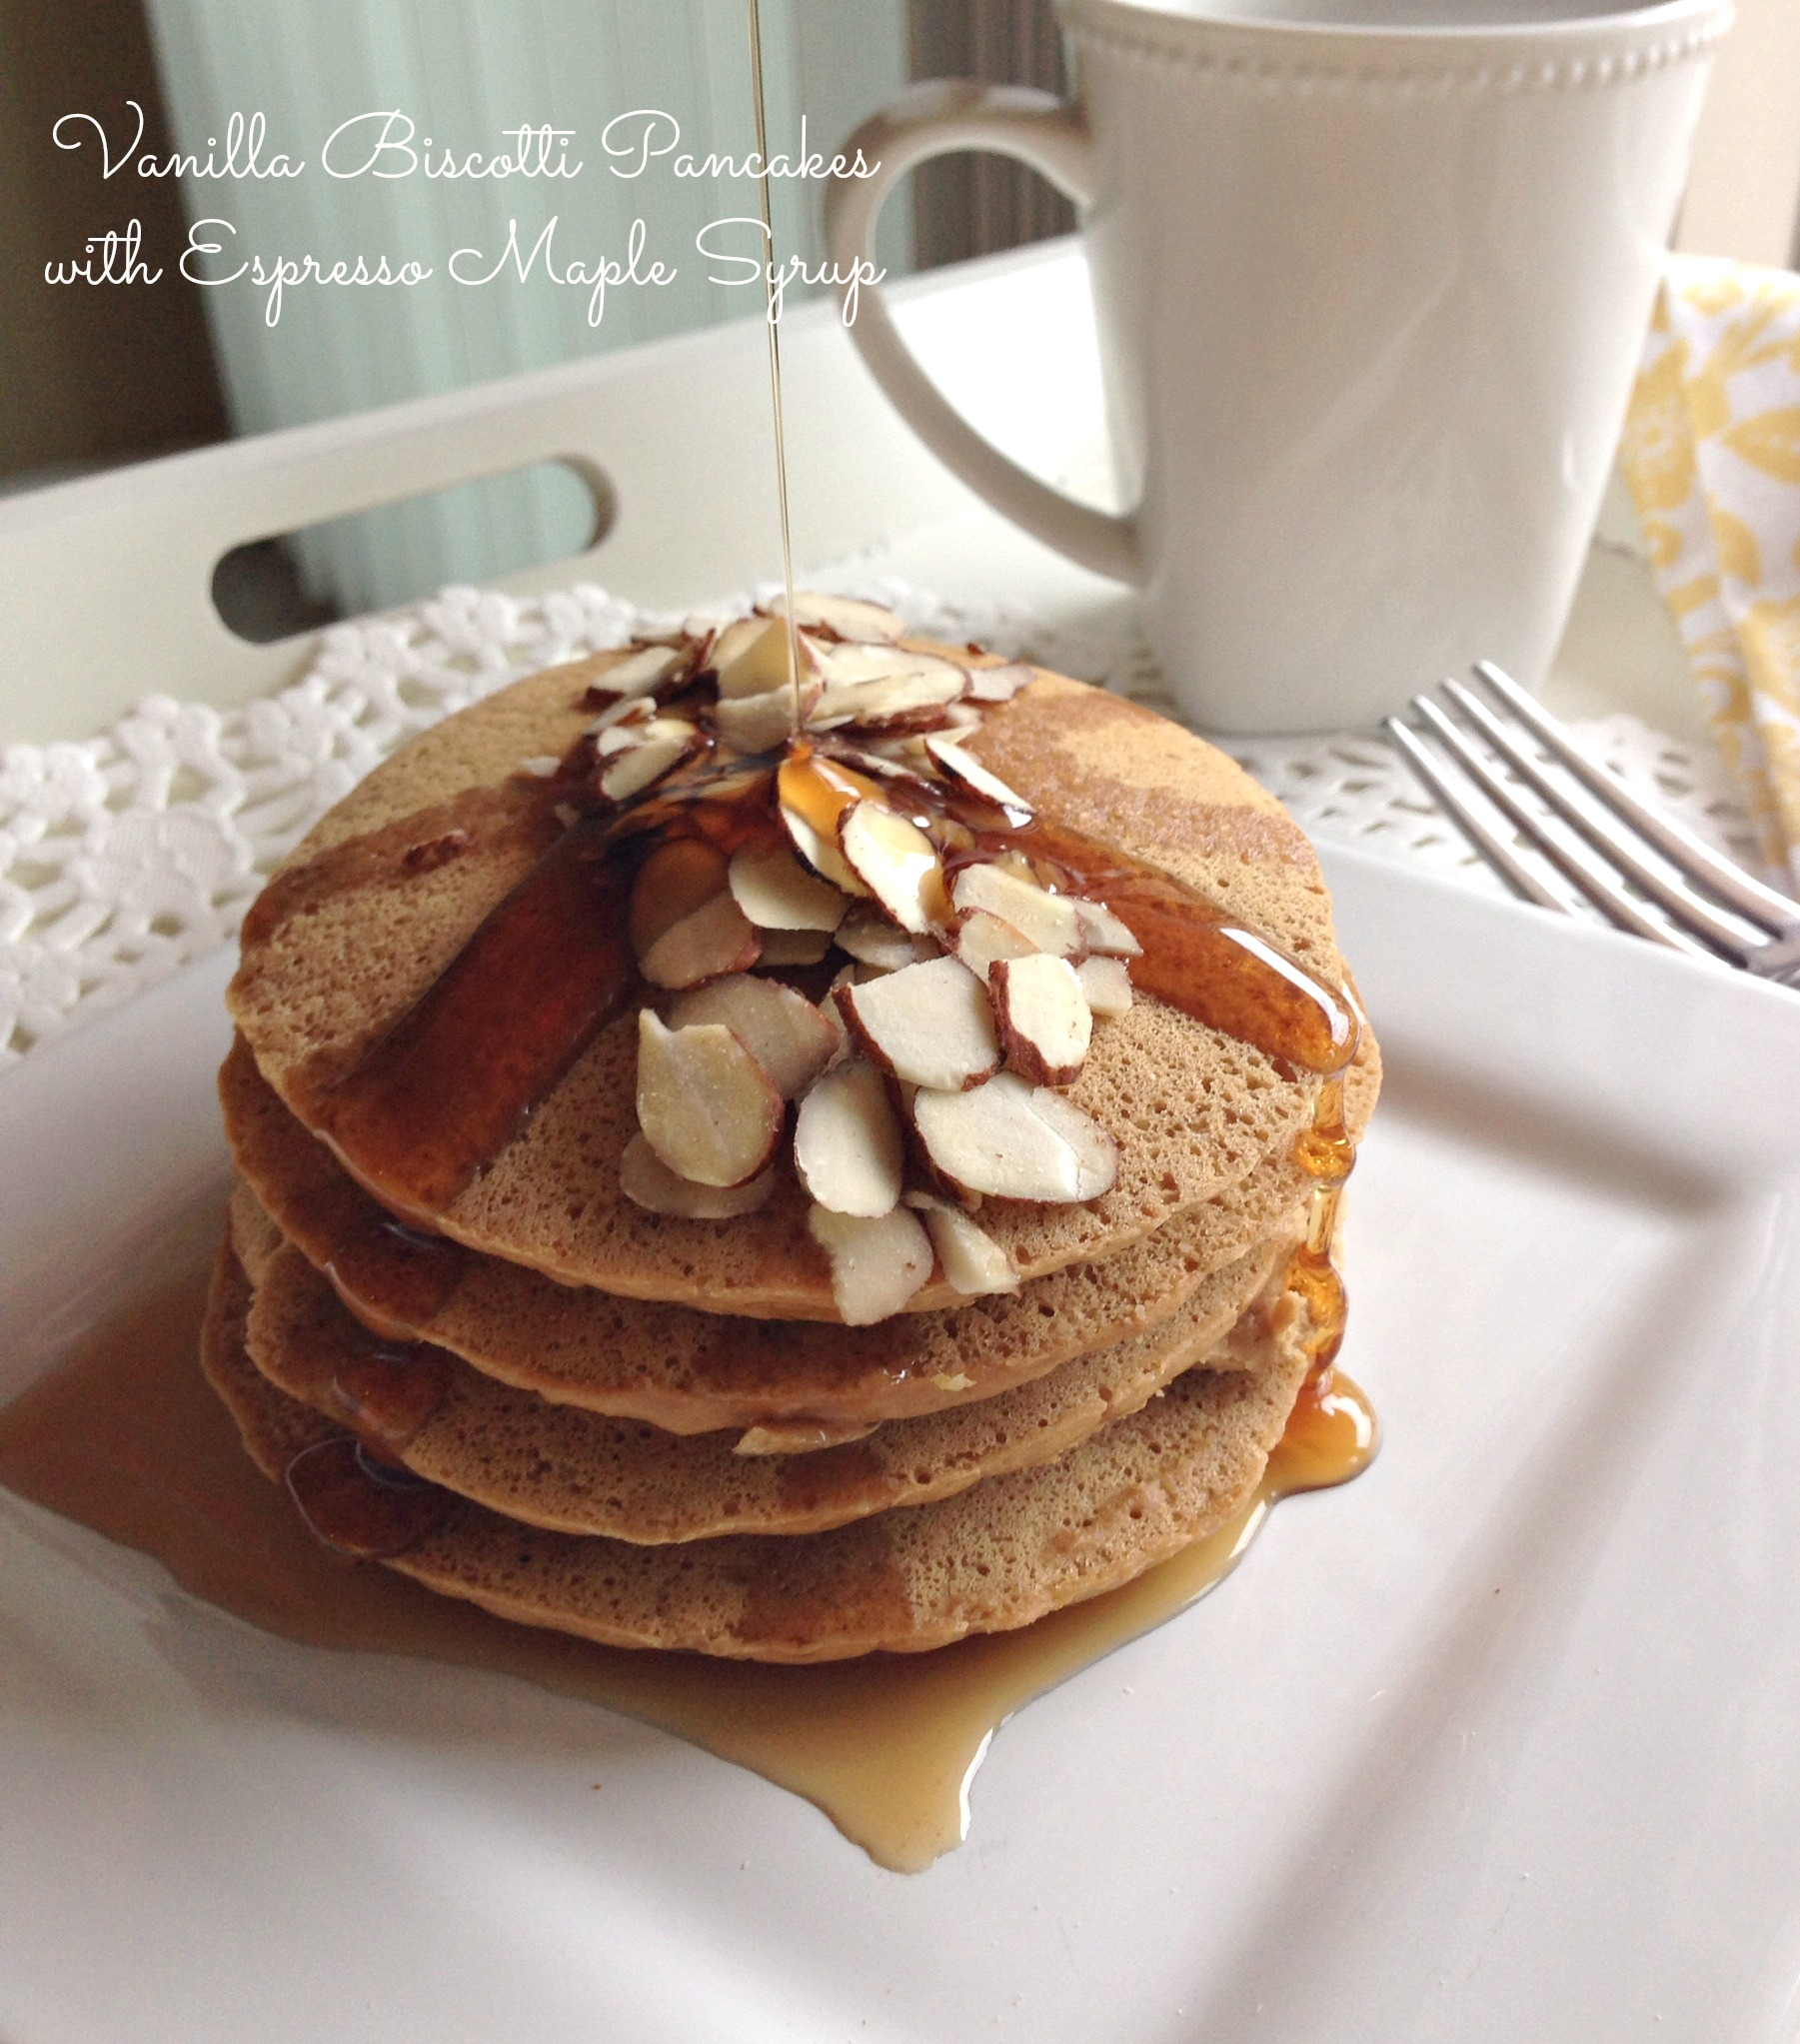 Vanilla Biscotti Protein Pancakes with Espresso Maple Syrup